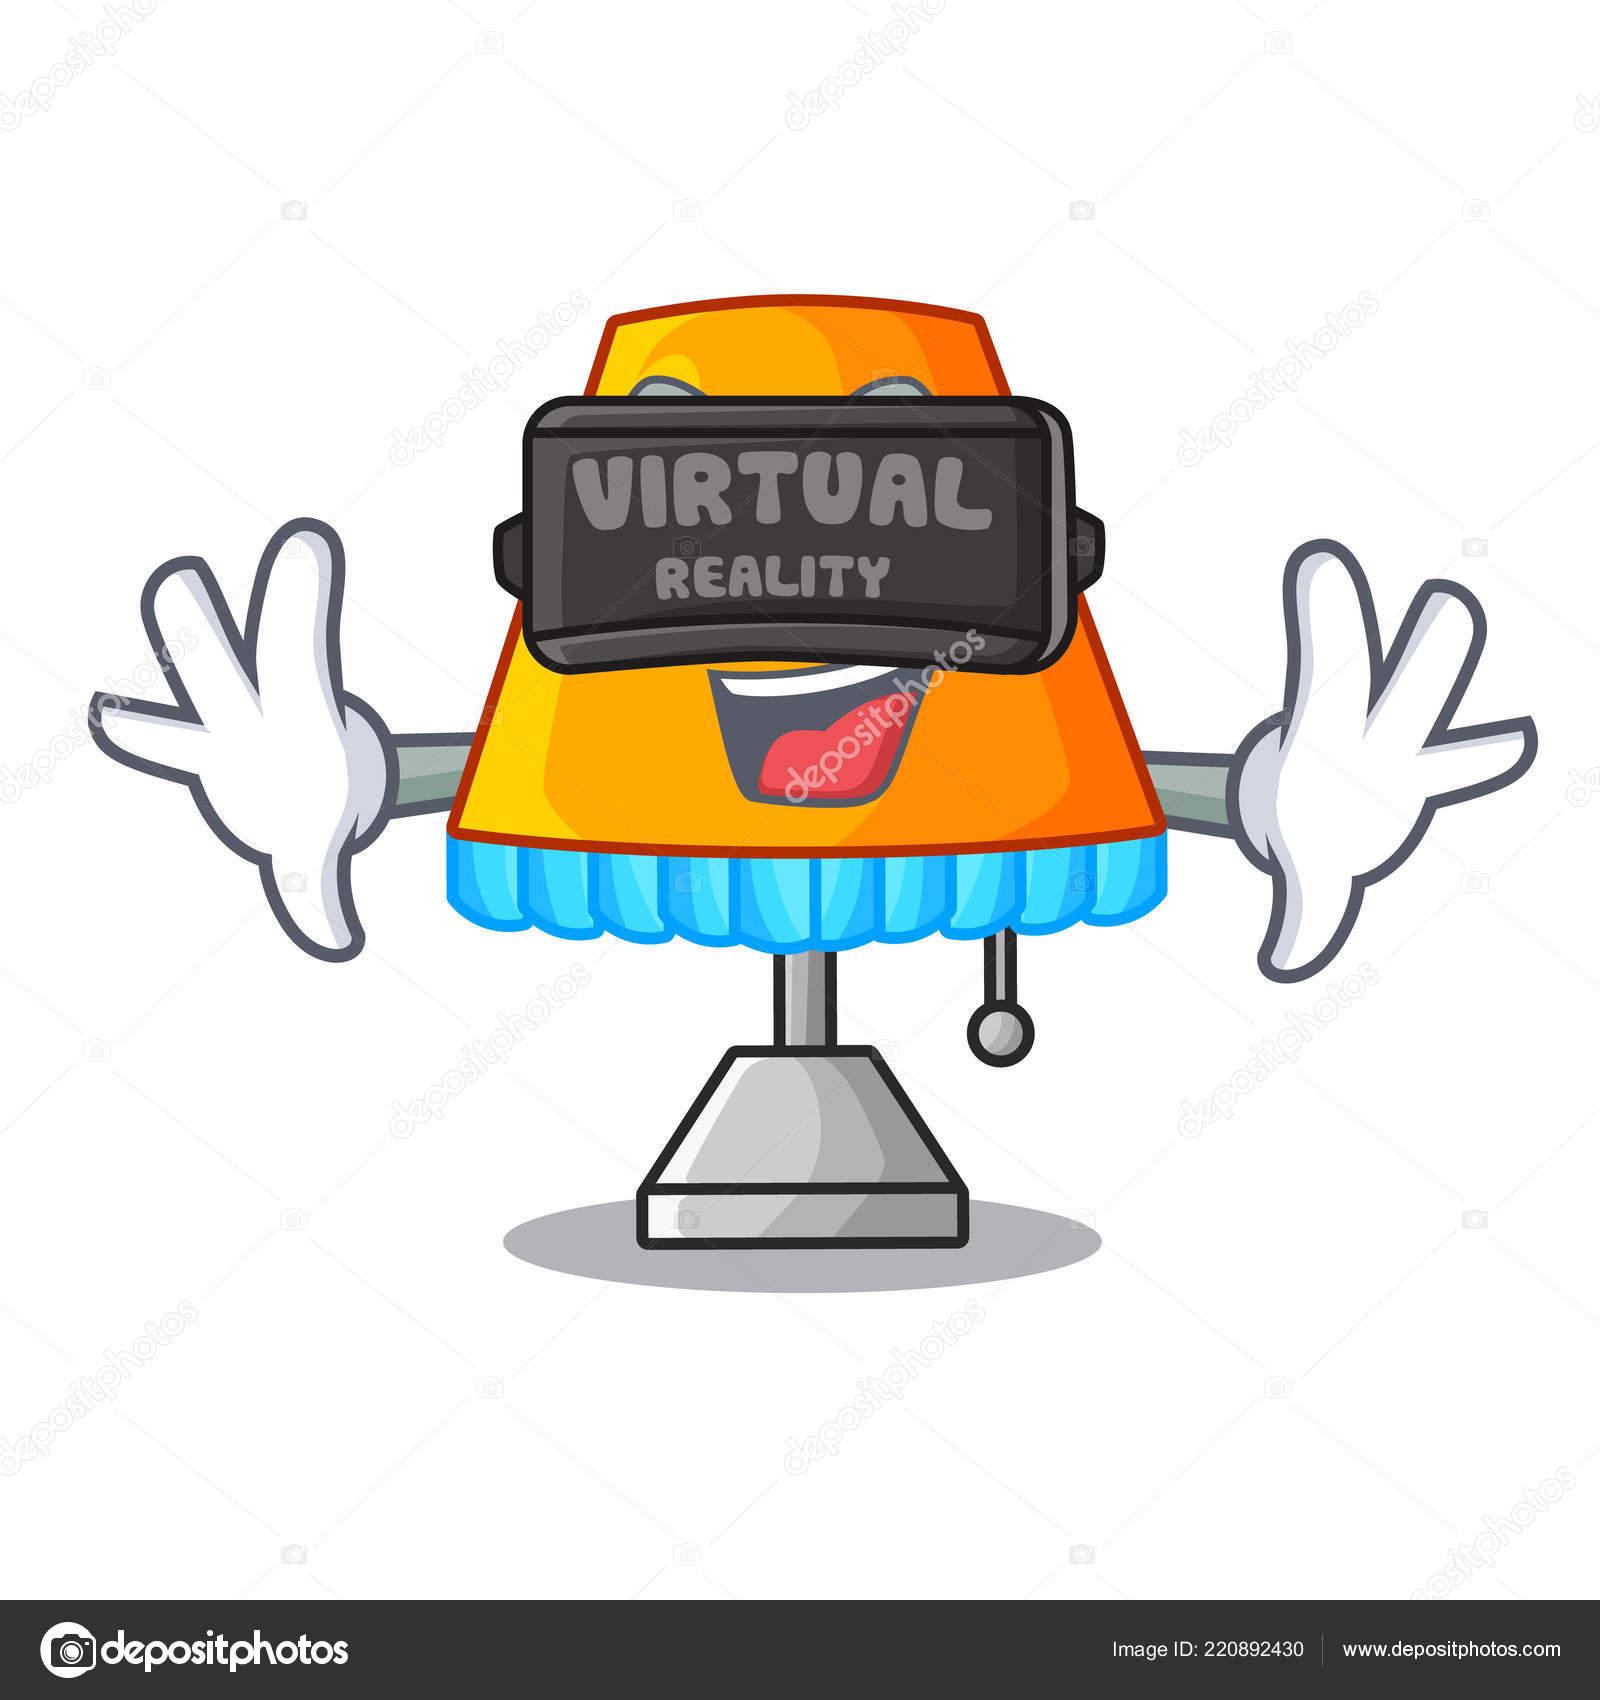 Virtualni Realita Kresleny Hlidani Zidlicka Vektorove Ilustrace